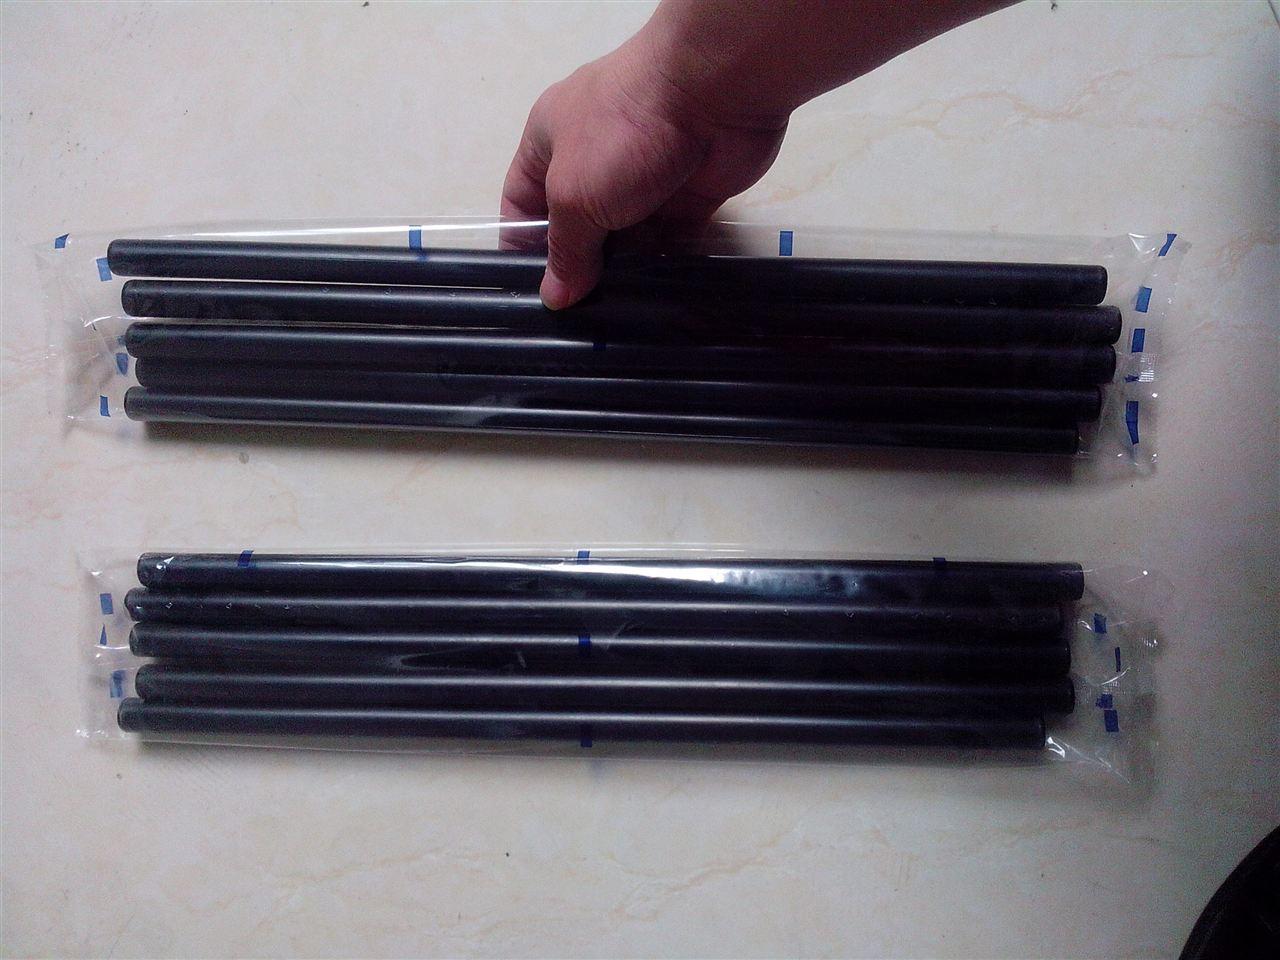 <strong>卫浴衣架铝杆包装机械 博伽卫浴零配件包装机设备</strong>